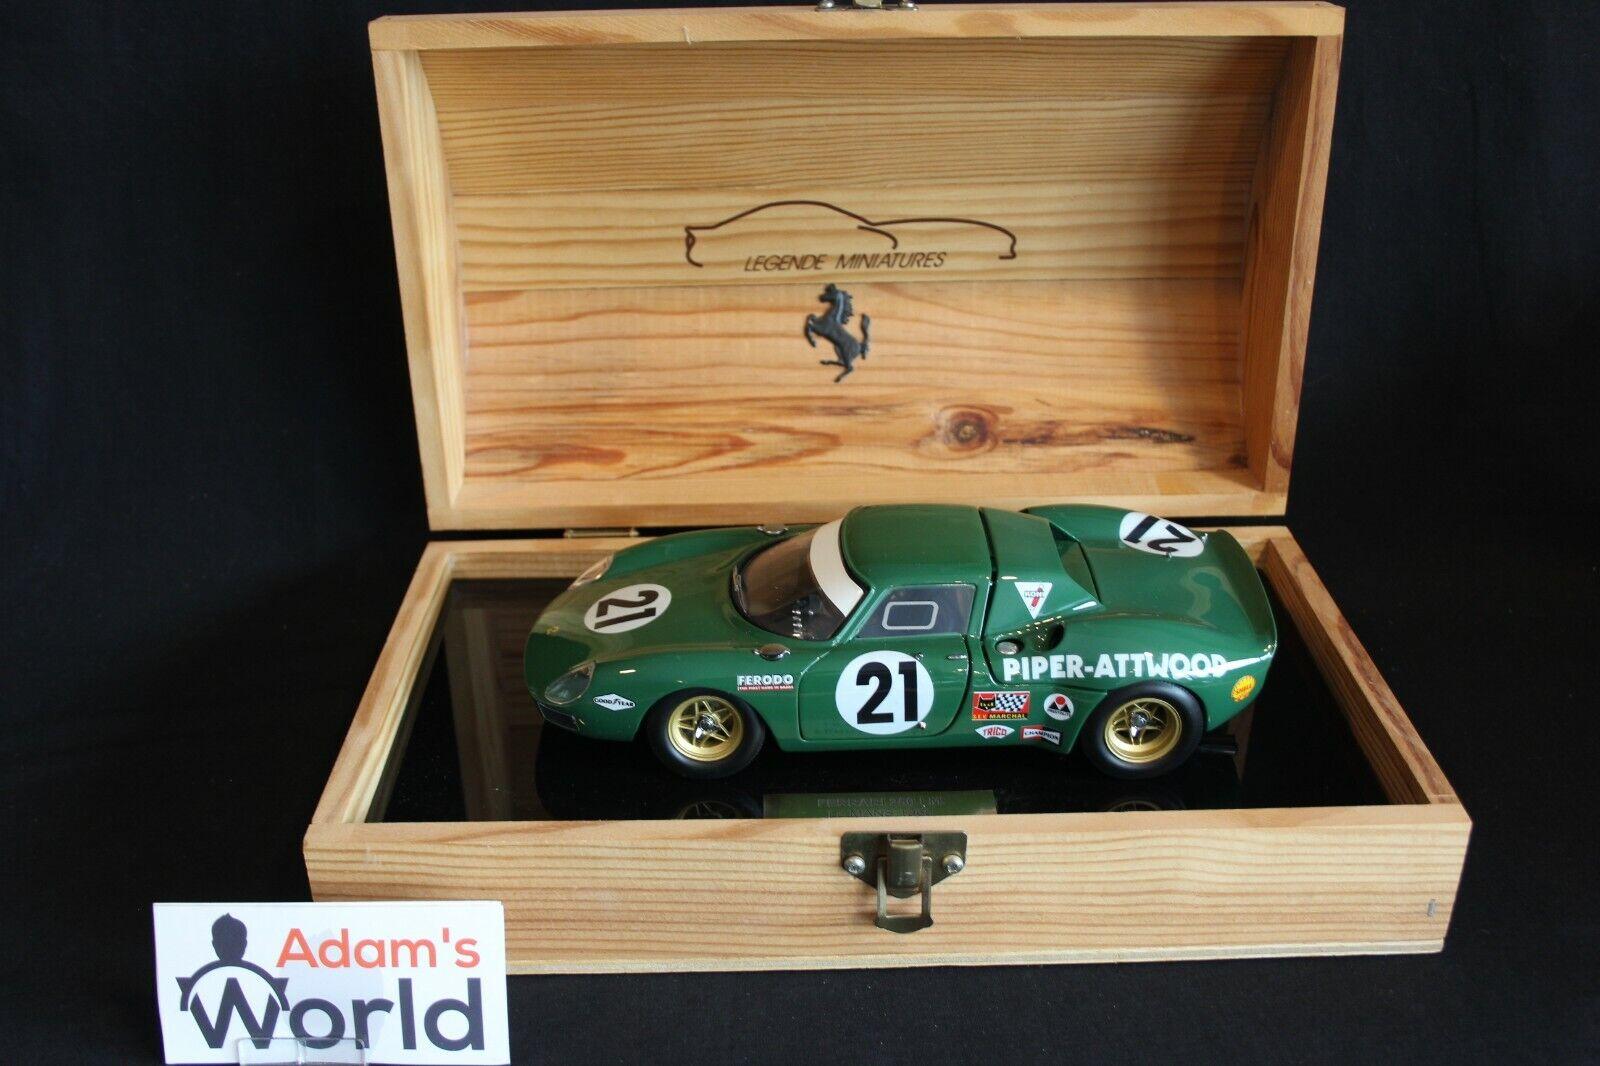 Legende Miniatures Ferrari 250 LM 1968 1 18  21 24h Le Mans (PJBB)